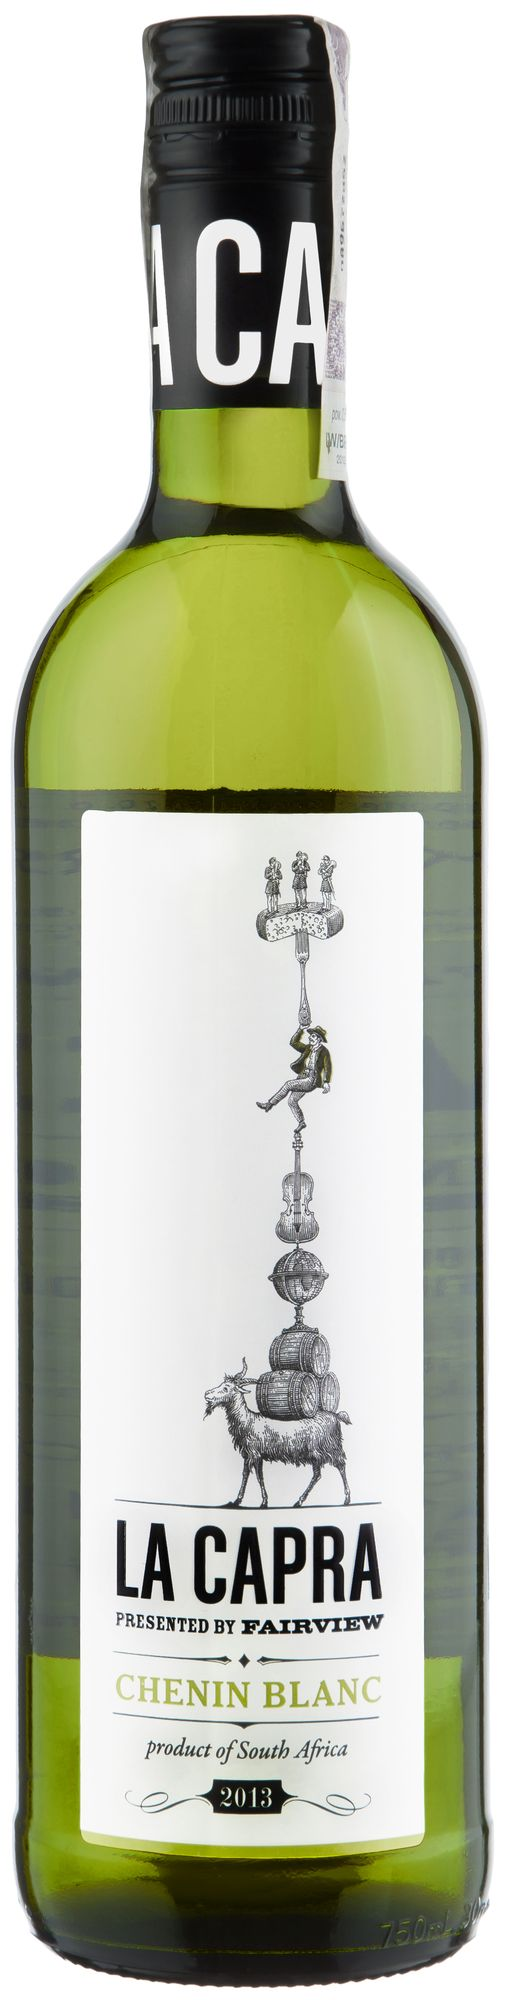 Wino La Capra Chenin Blanc